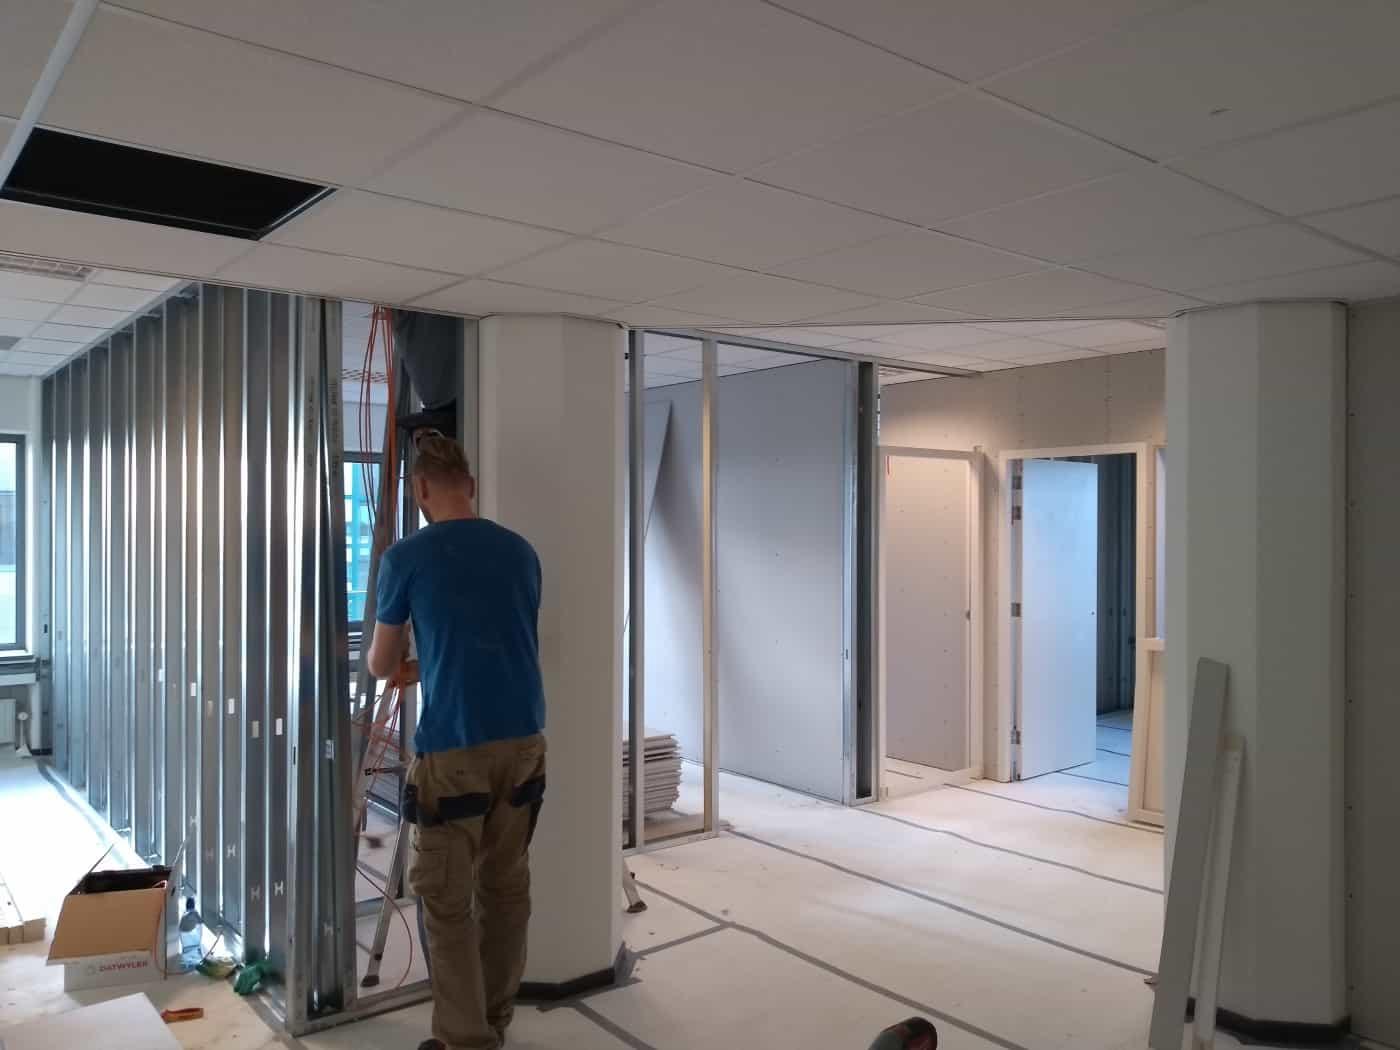 Metalstudwanden plaatsen kantoorpand Rotterdam